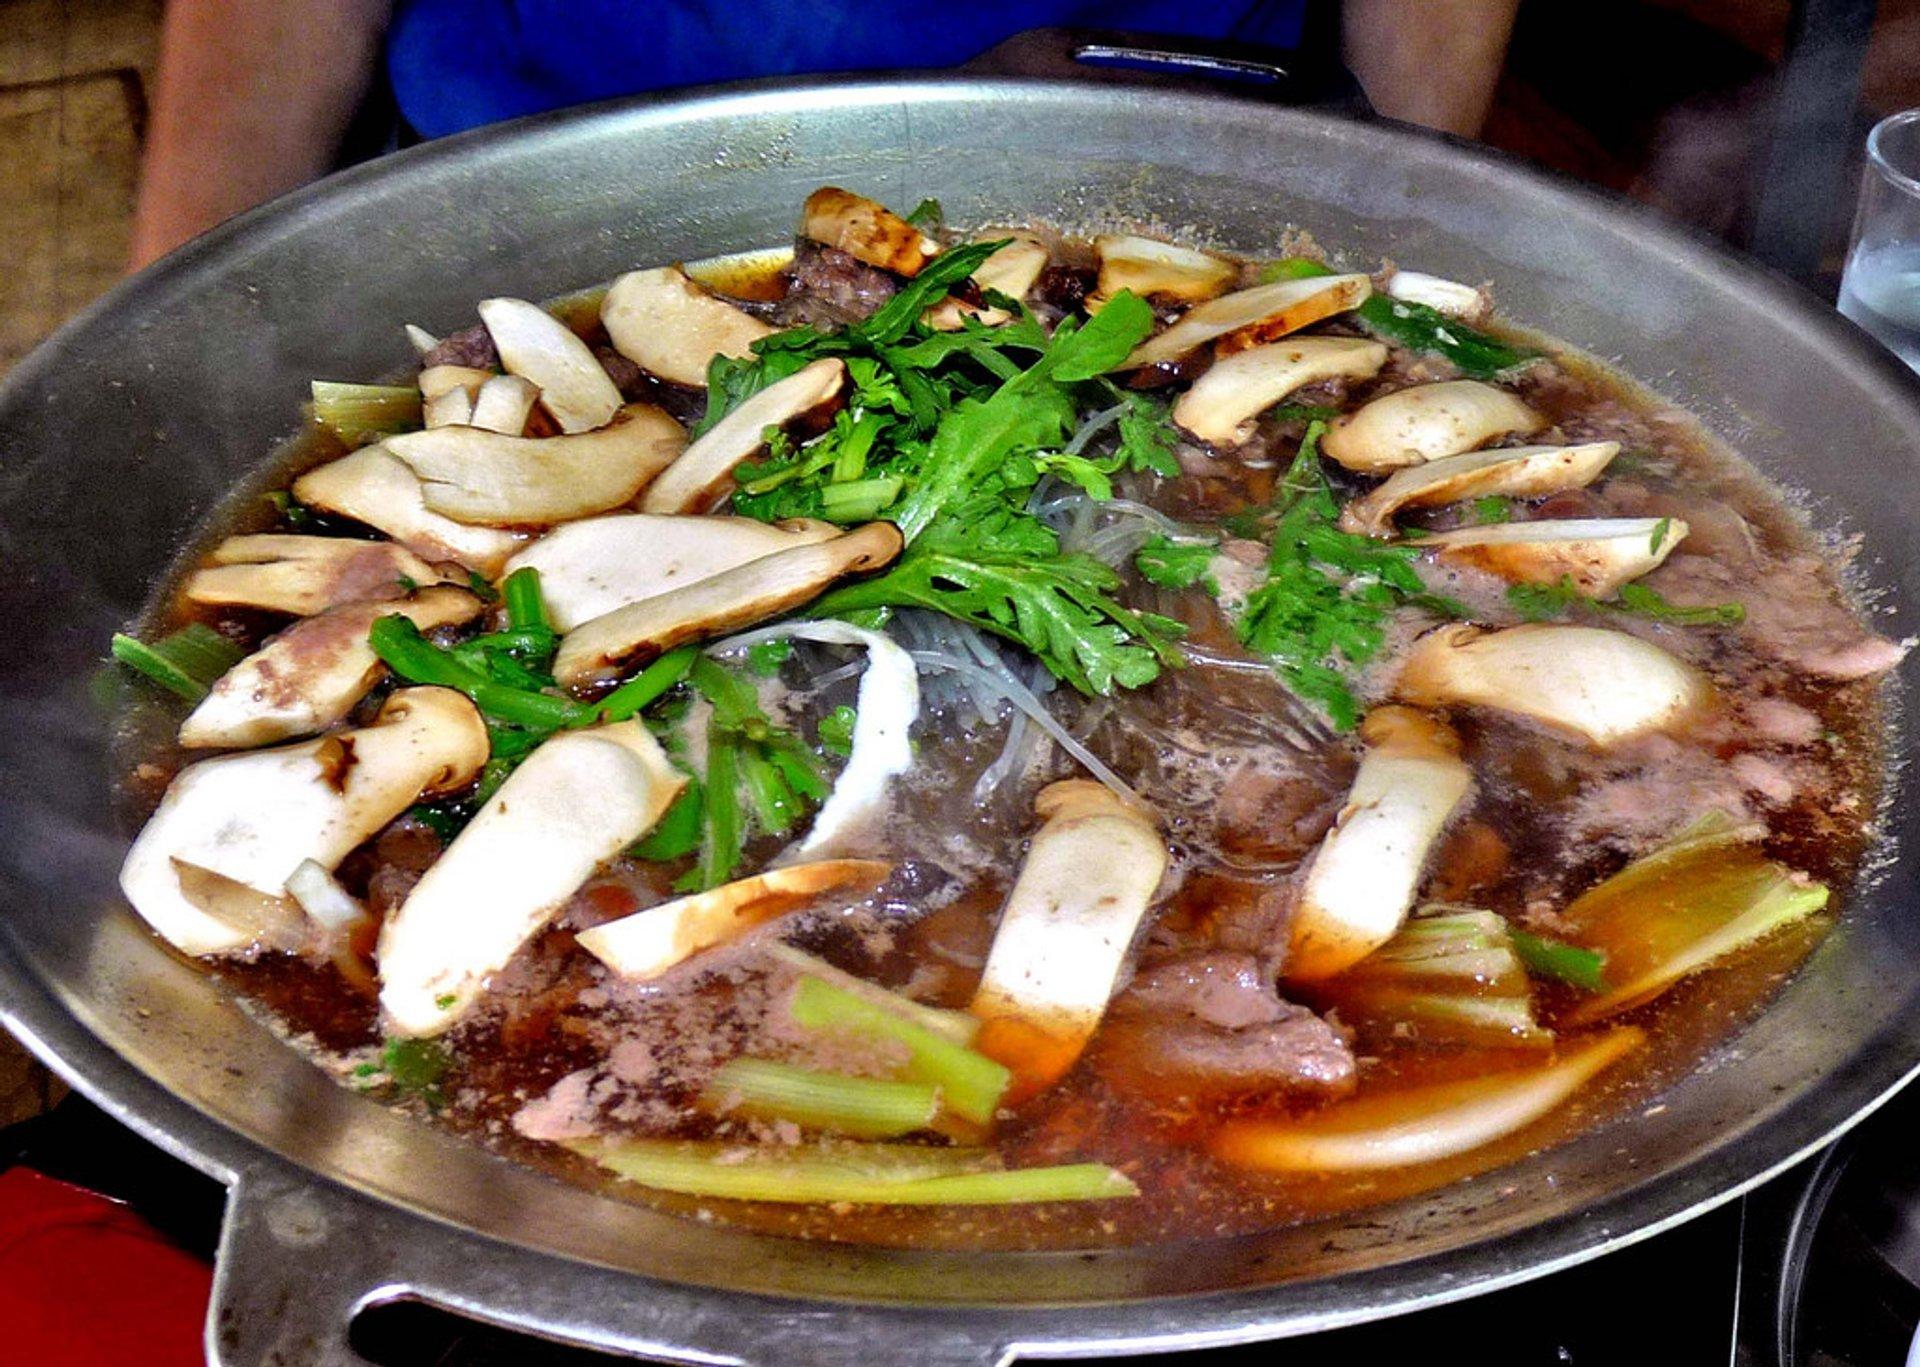 Pine Mushrooms (Songi) in South Korea - Best Time